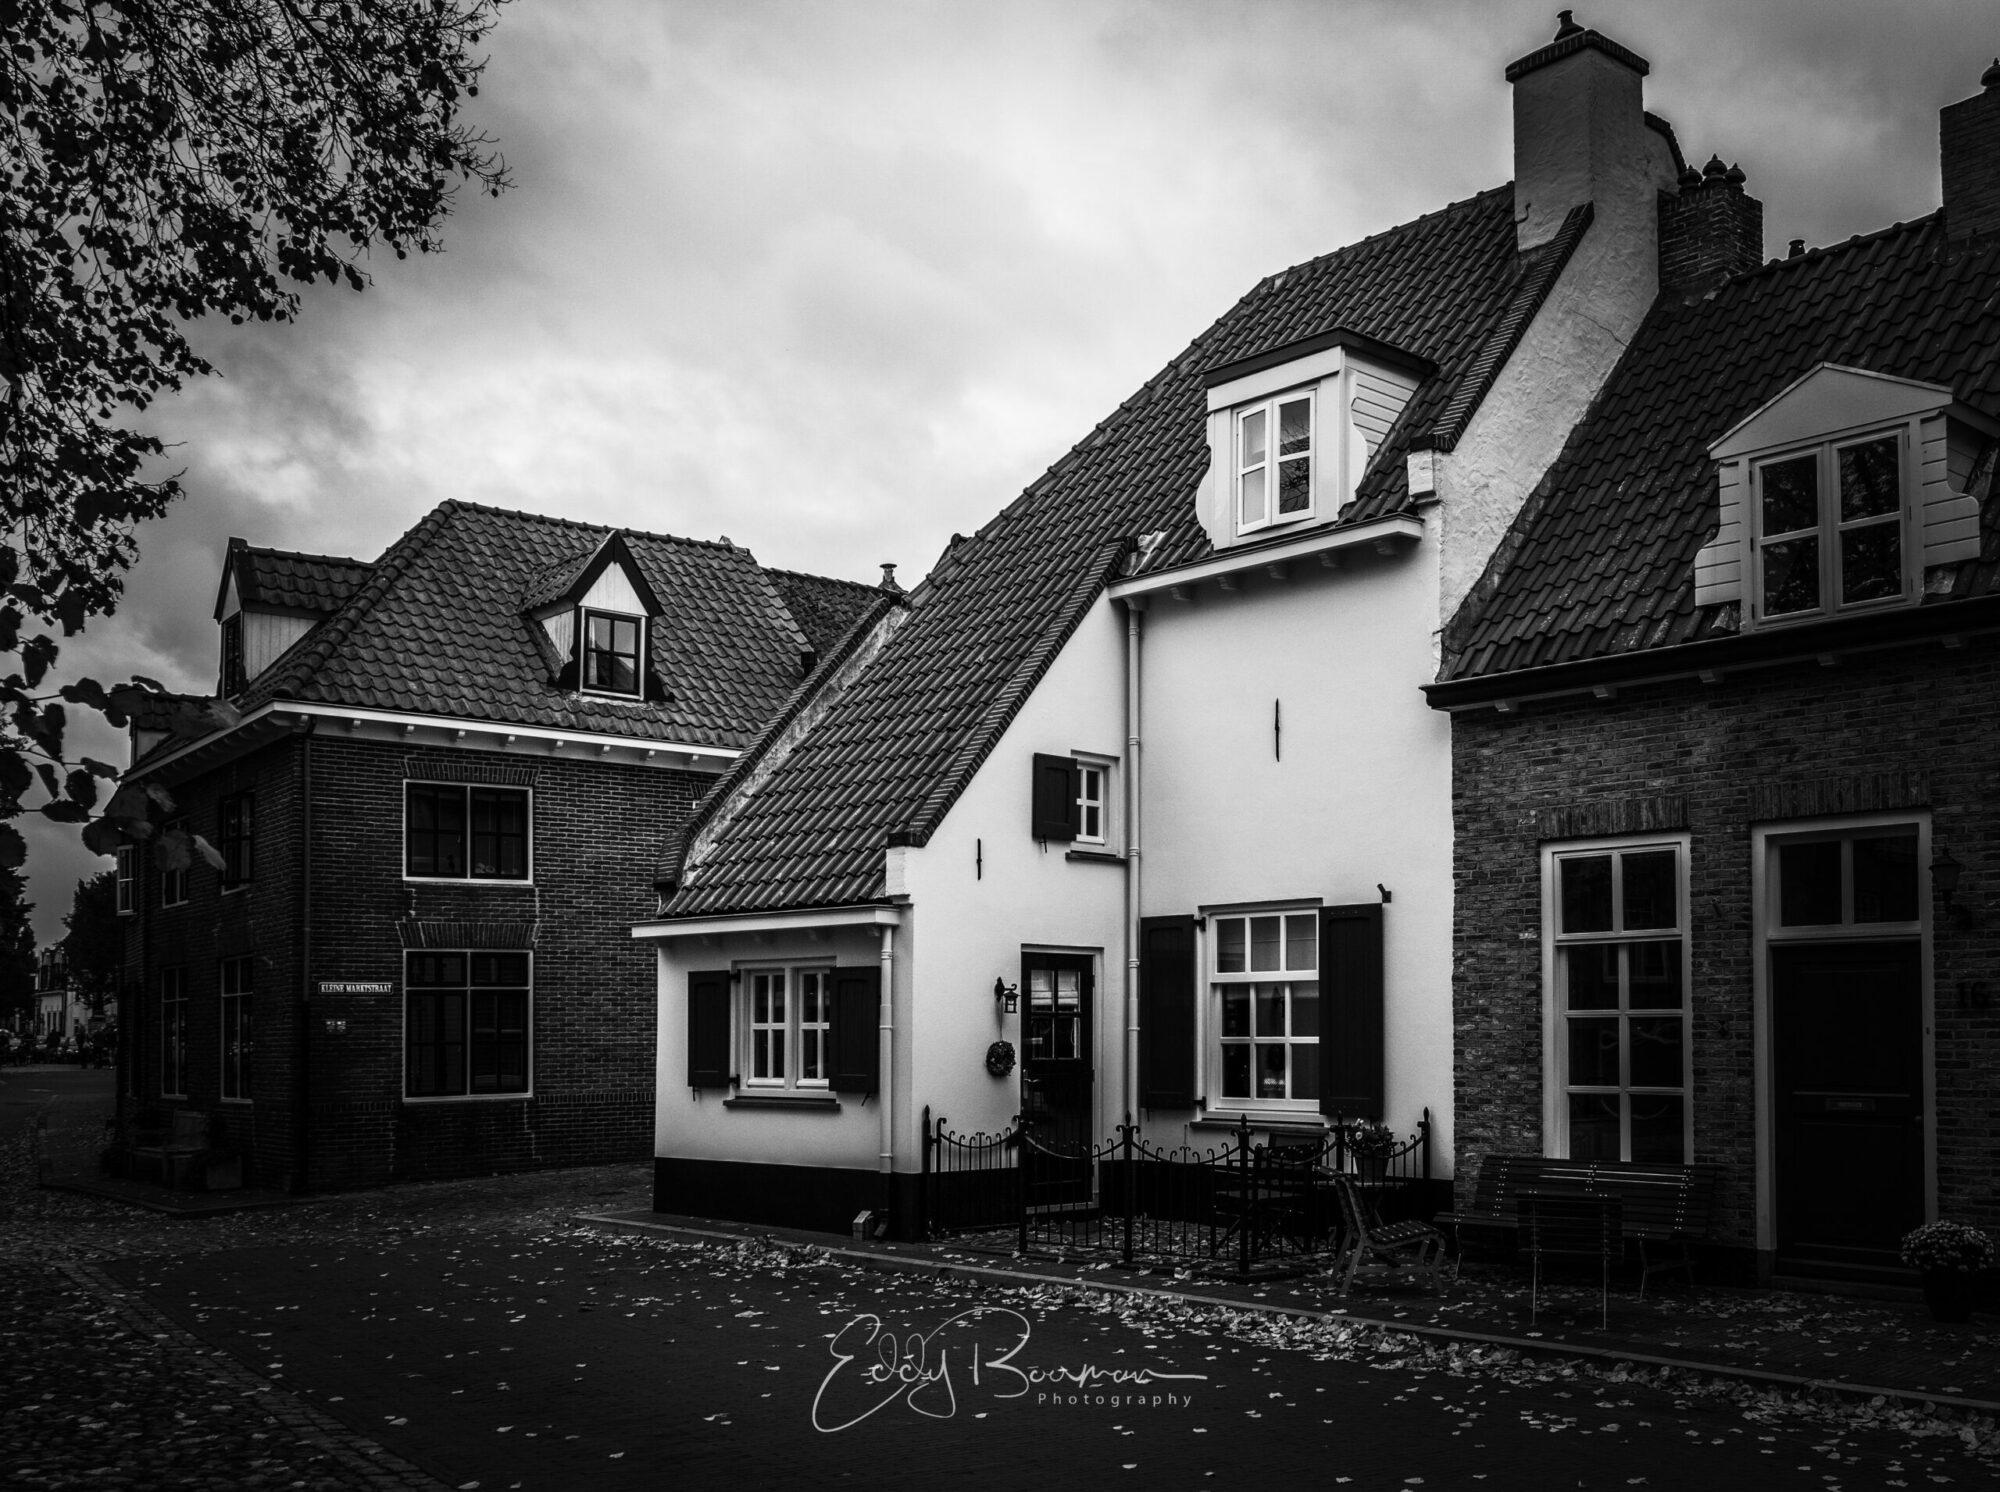 Eddy Boerman Photography (NVJ)